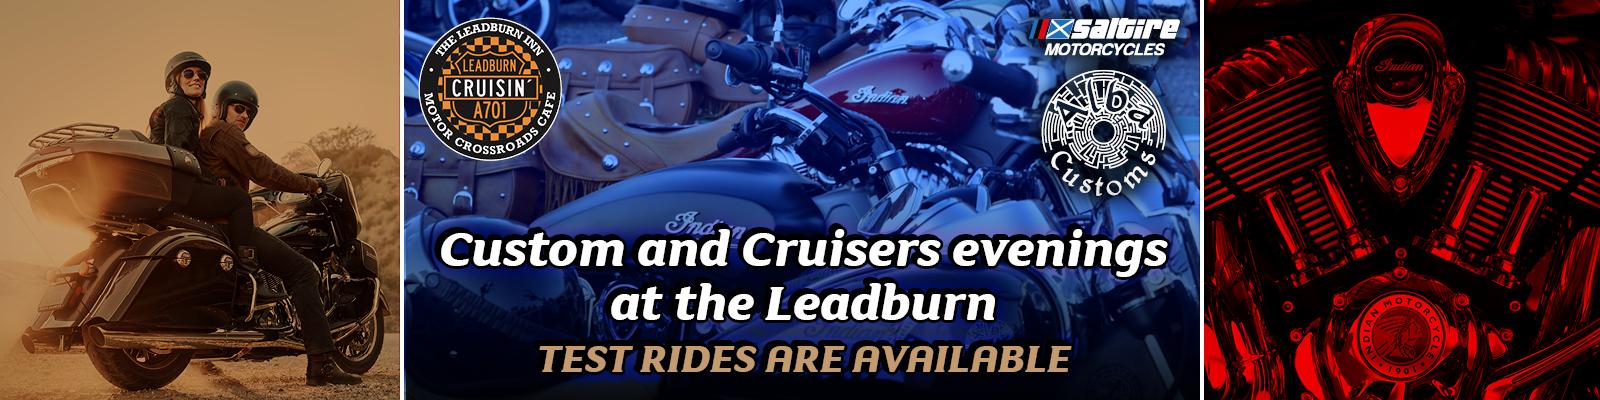 Leadburn customs and cruisers evening